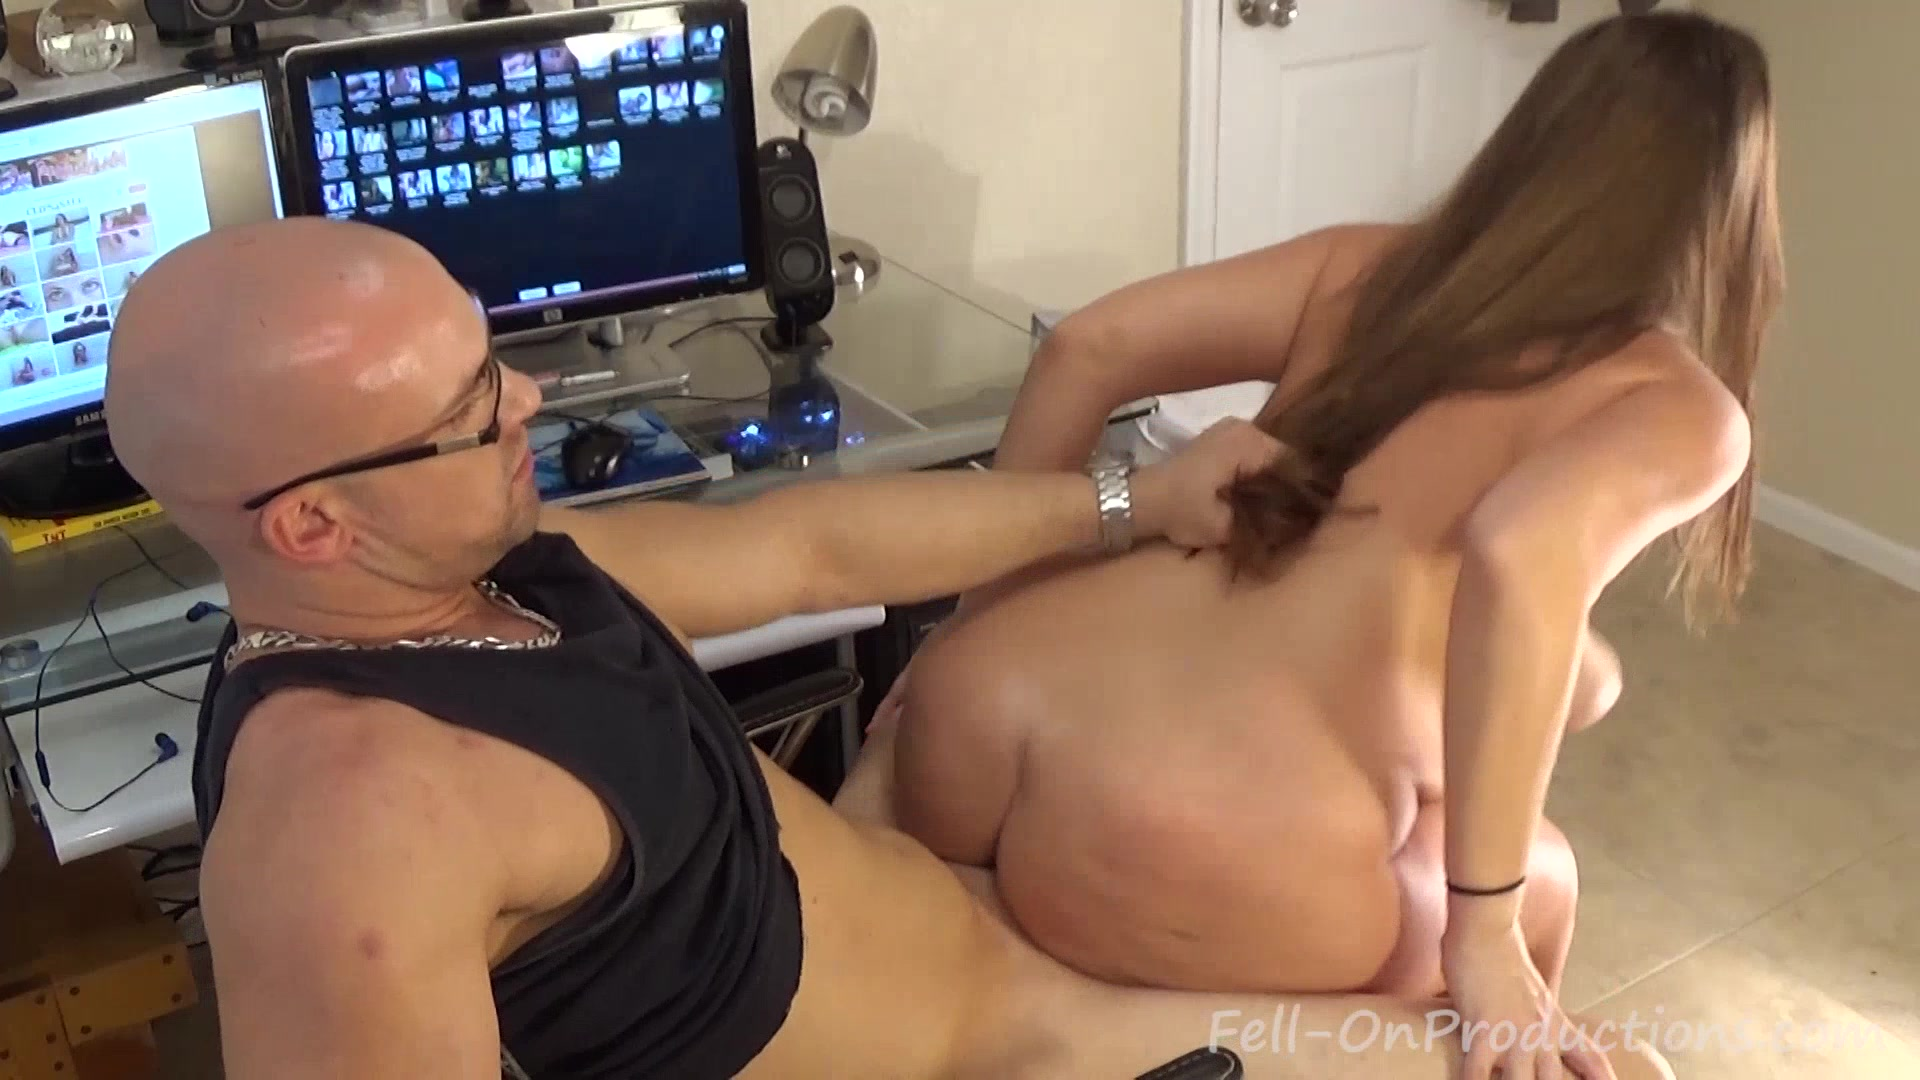 Застукала брата порно видео